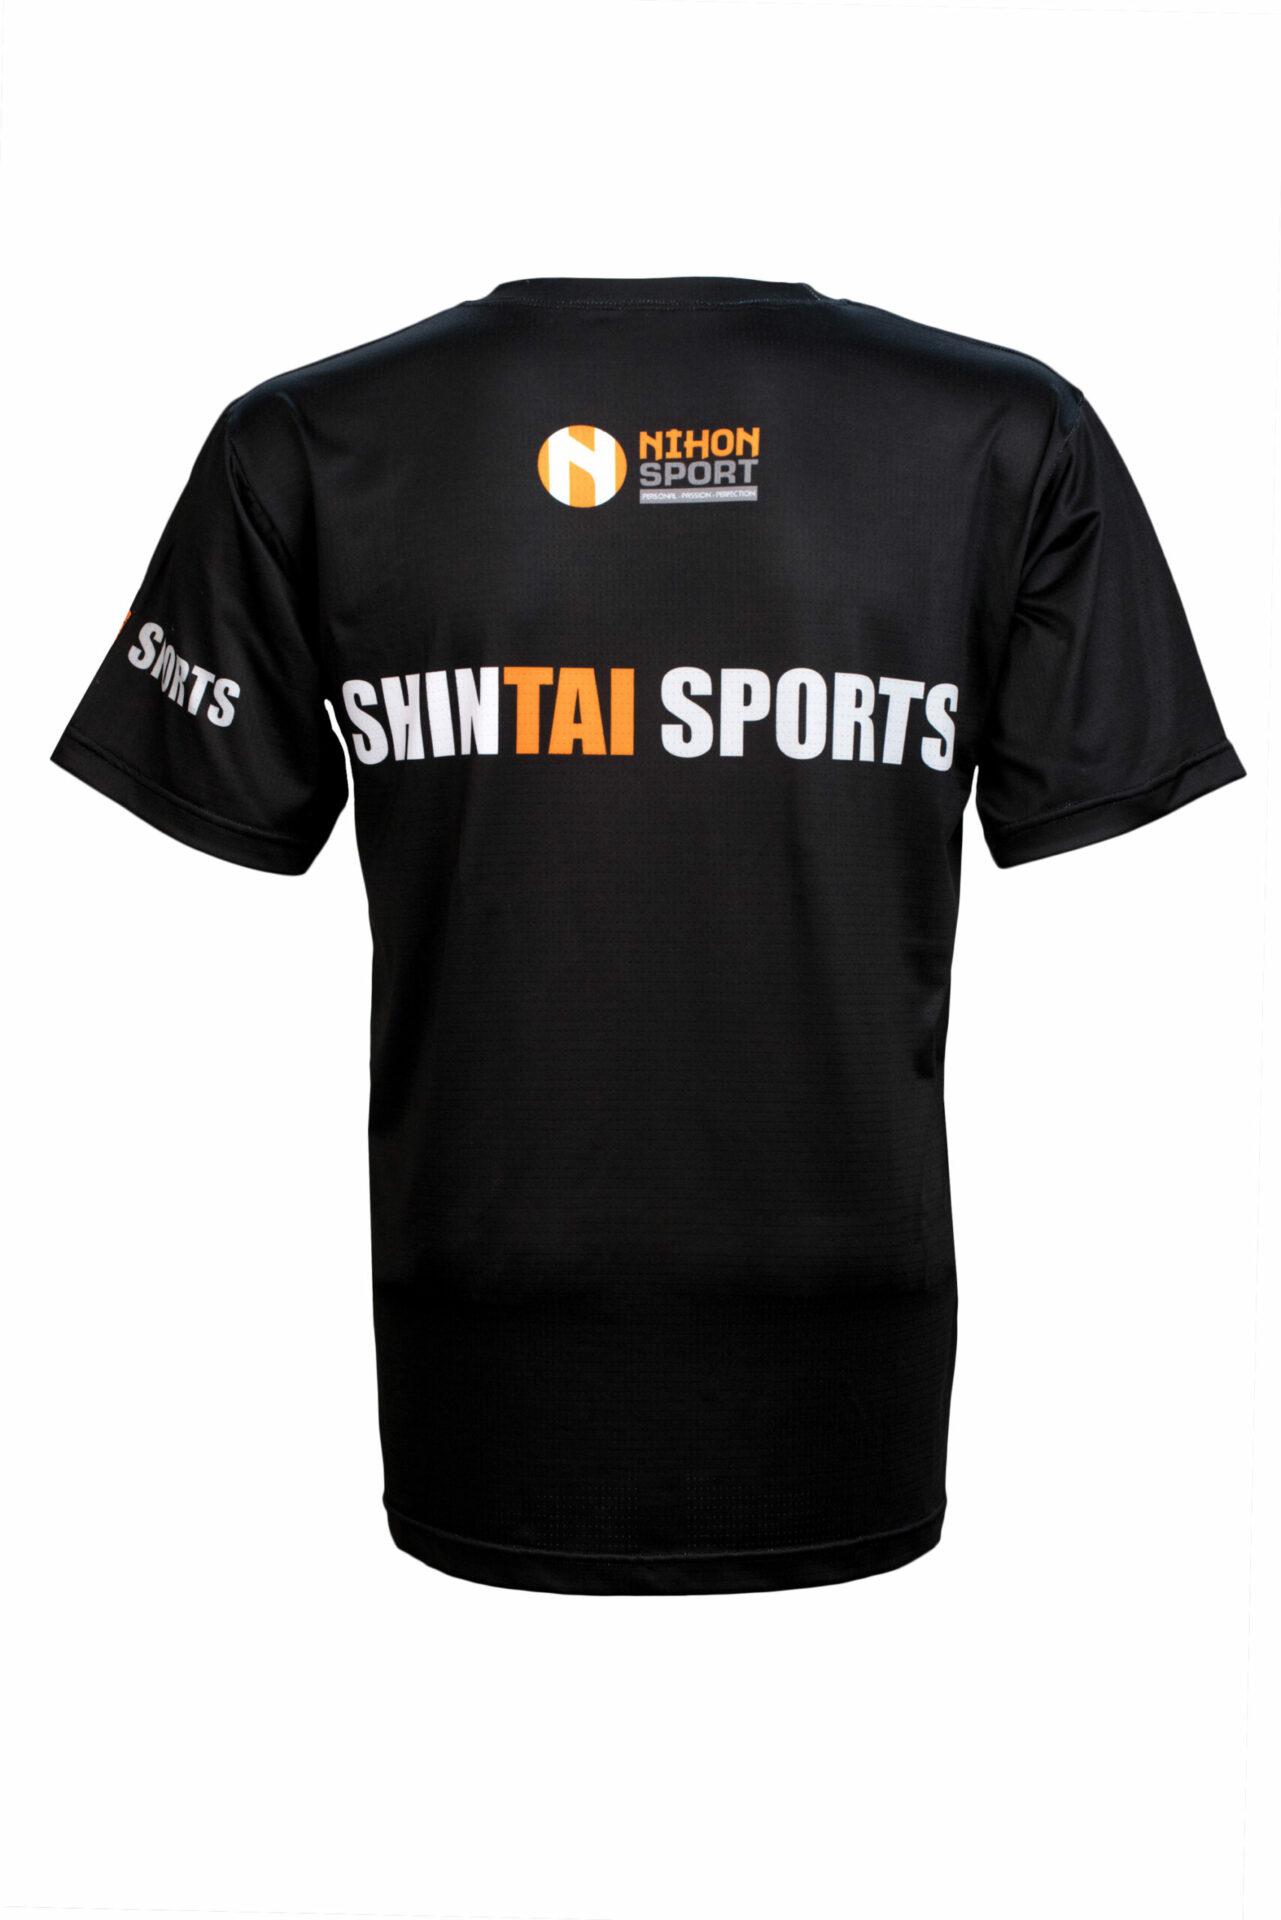 gesublimeerd sport shirt of rash guard